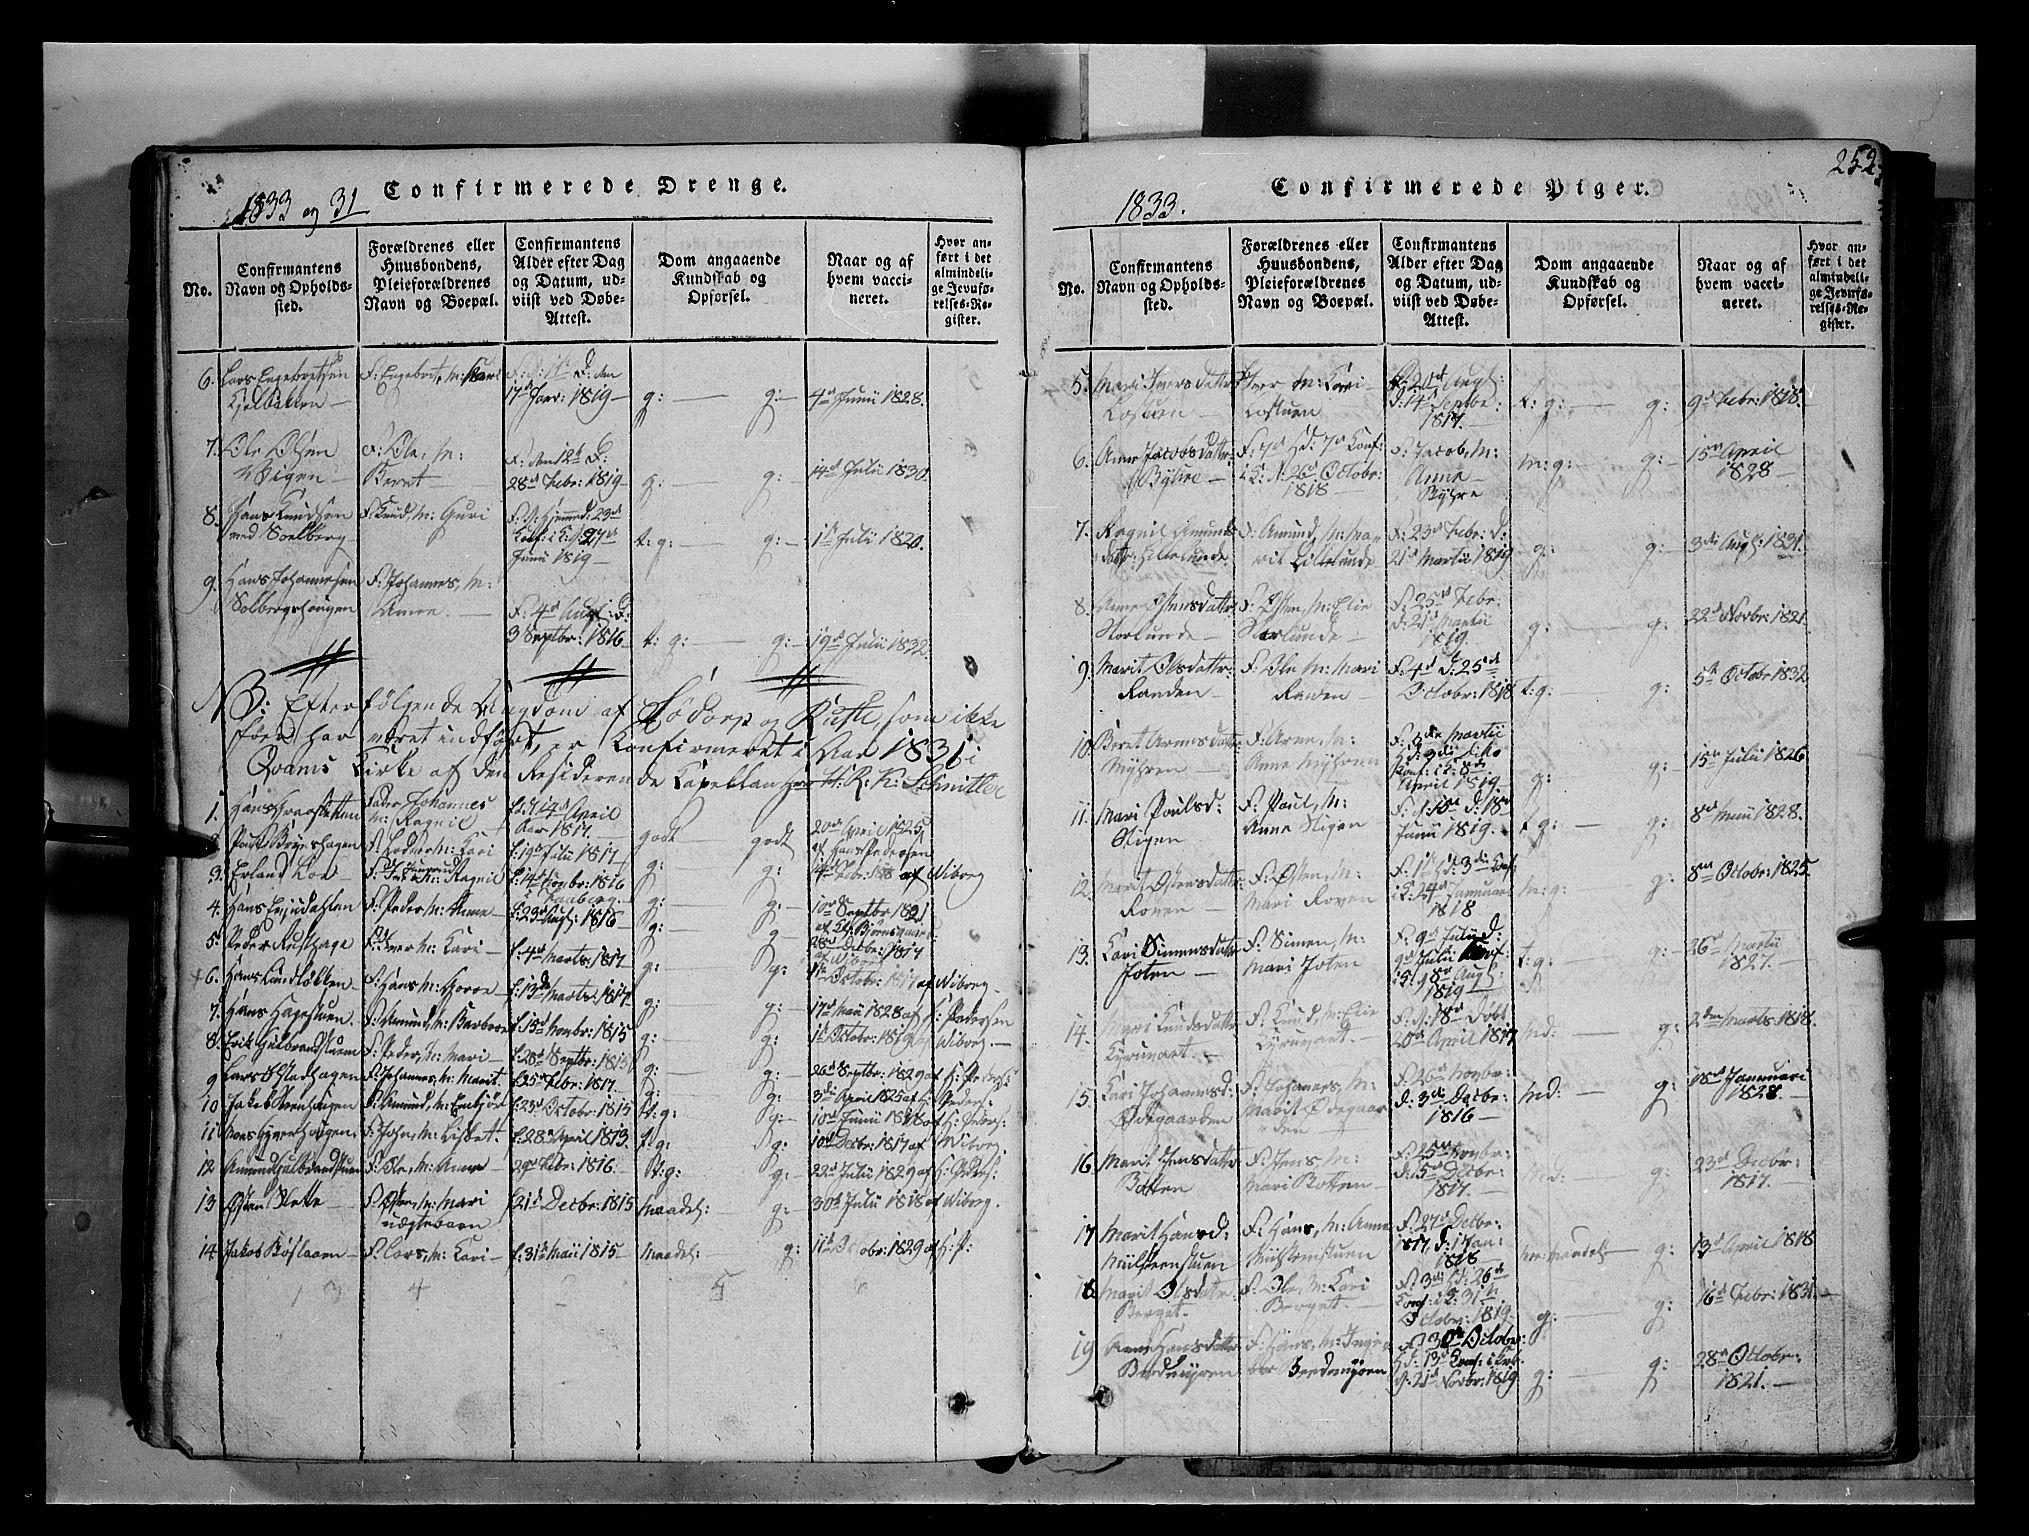 SAH, Fron prestekontor, H/Ha/Hab/L0004: Klokkerbok nr. 4, 1816-1850, s. 252